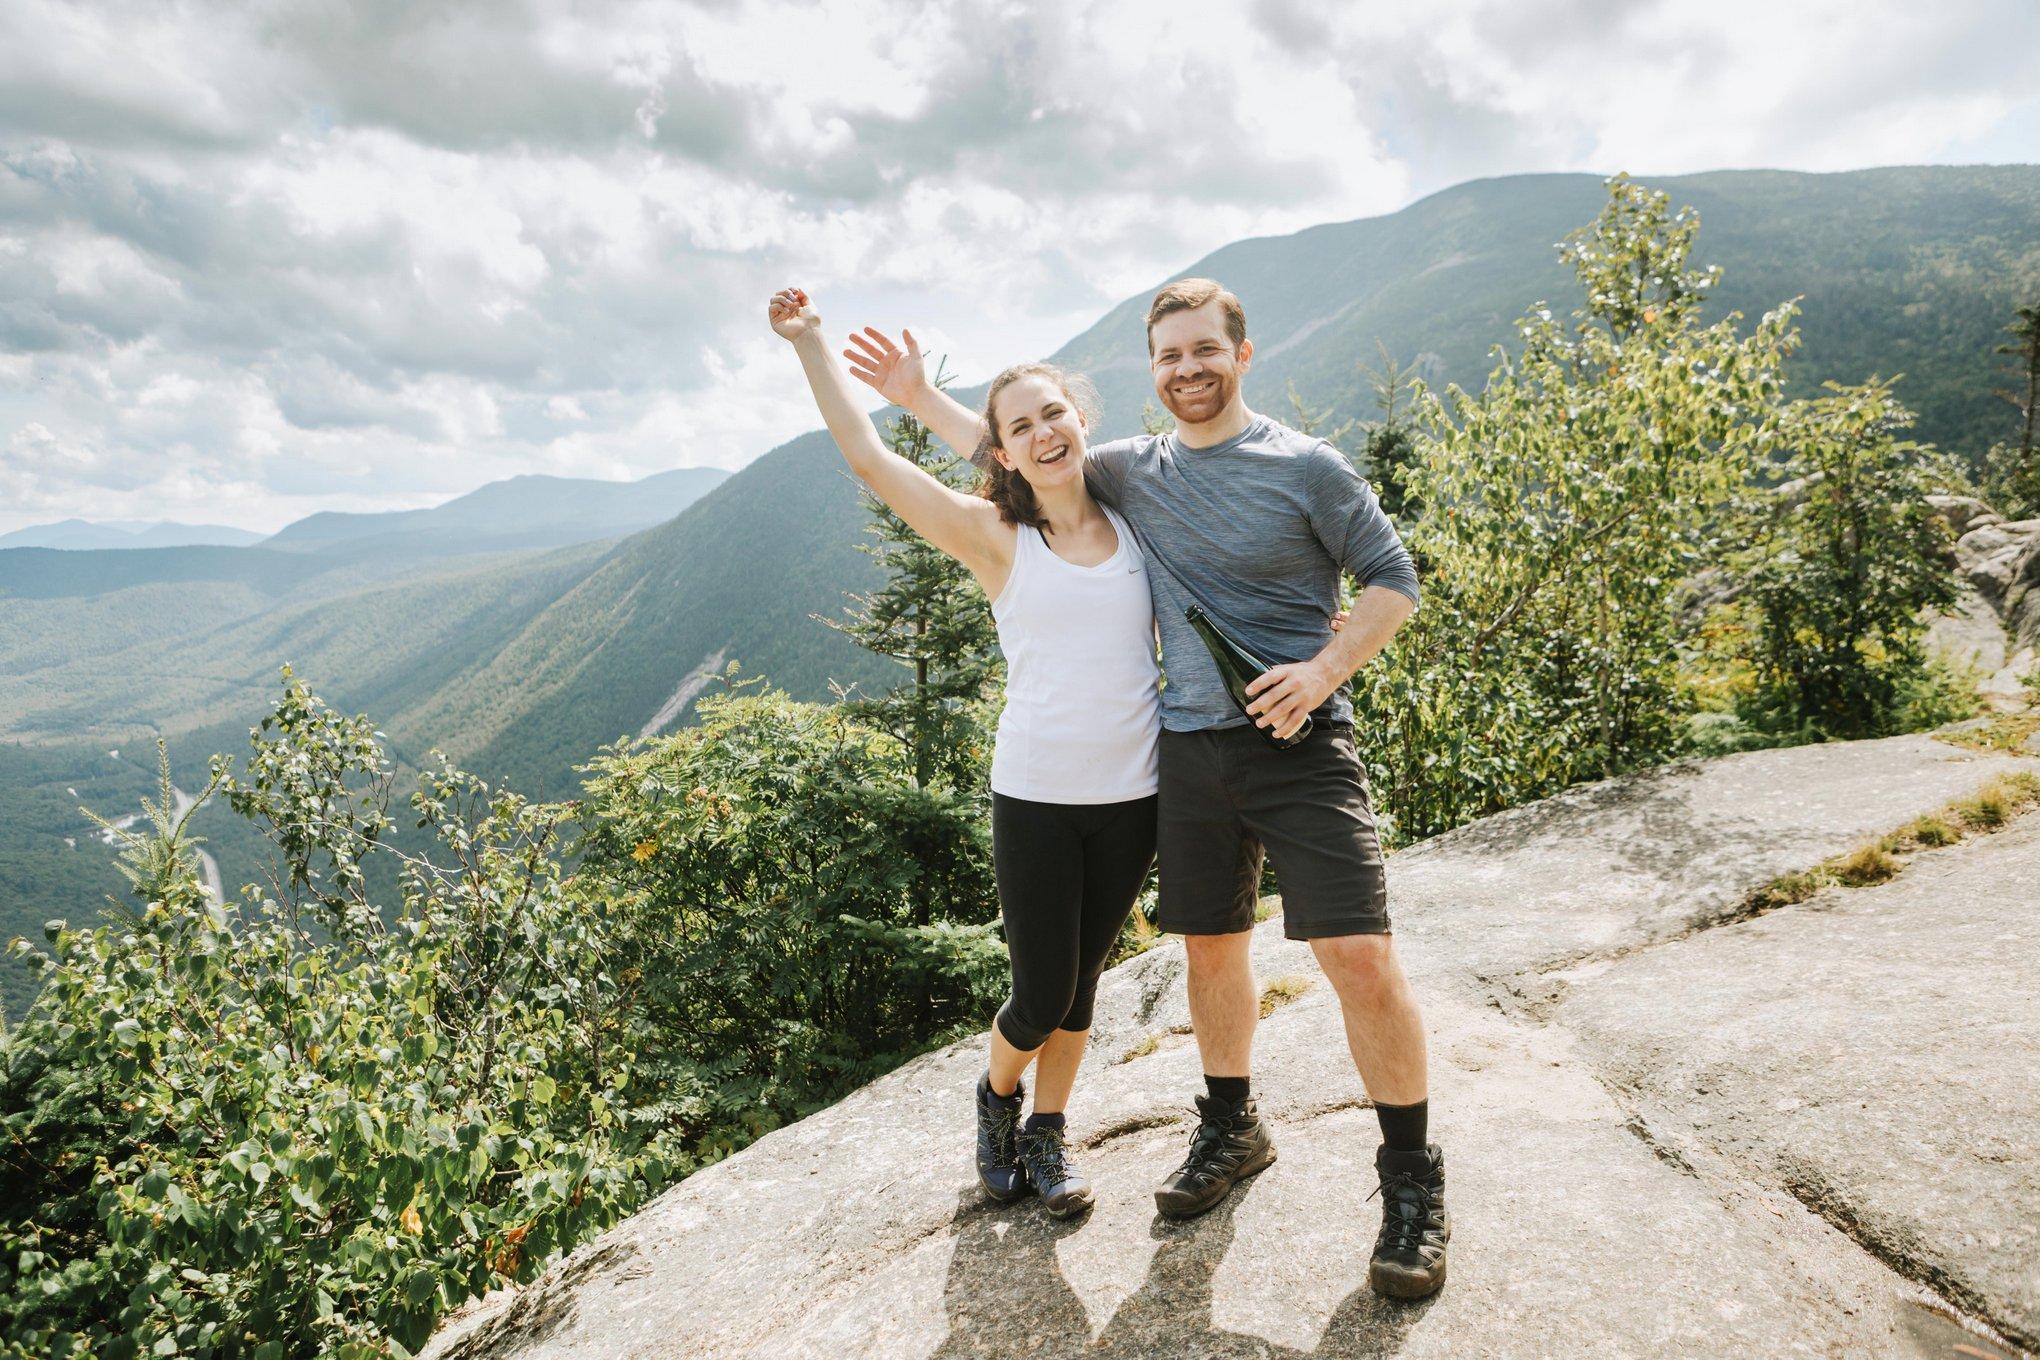 Mount-Willard-White-Mountains-Engagement-Elopement-Lena-Mirisola-23.JPG